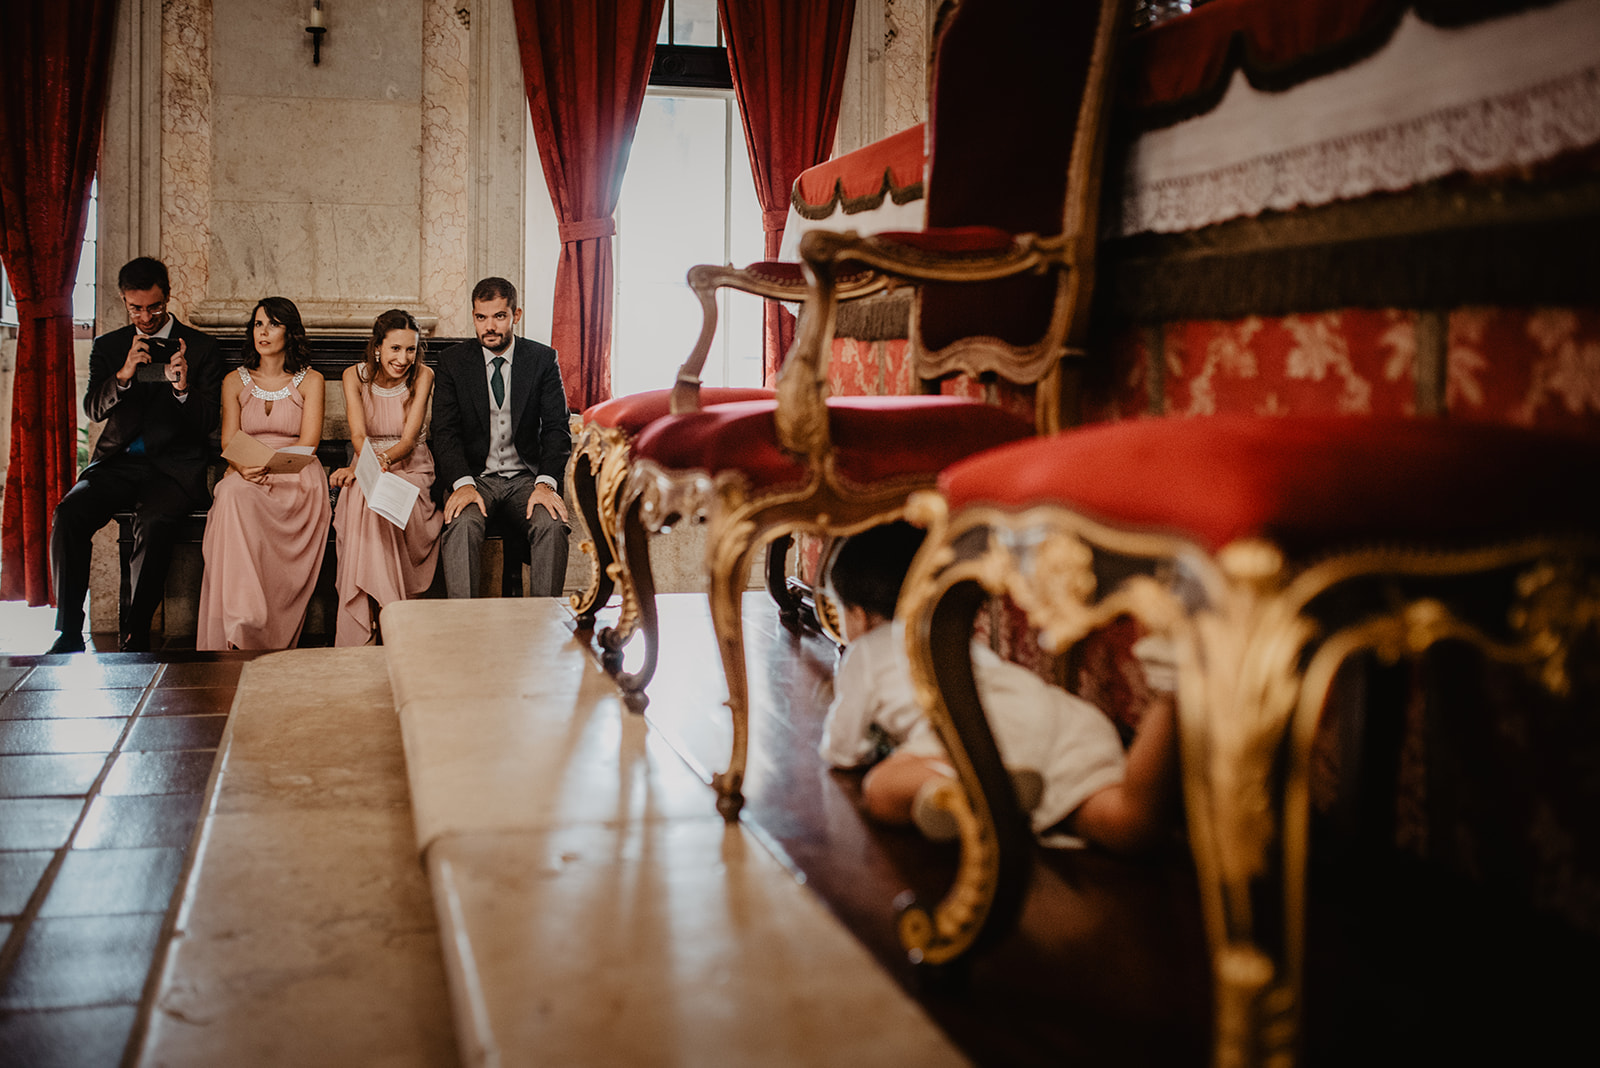 Lapela-photography-wedding-algarve-portugal-best-of-103.jpg